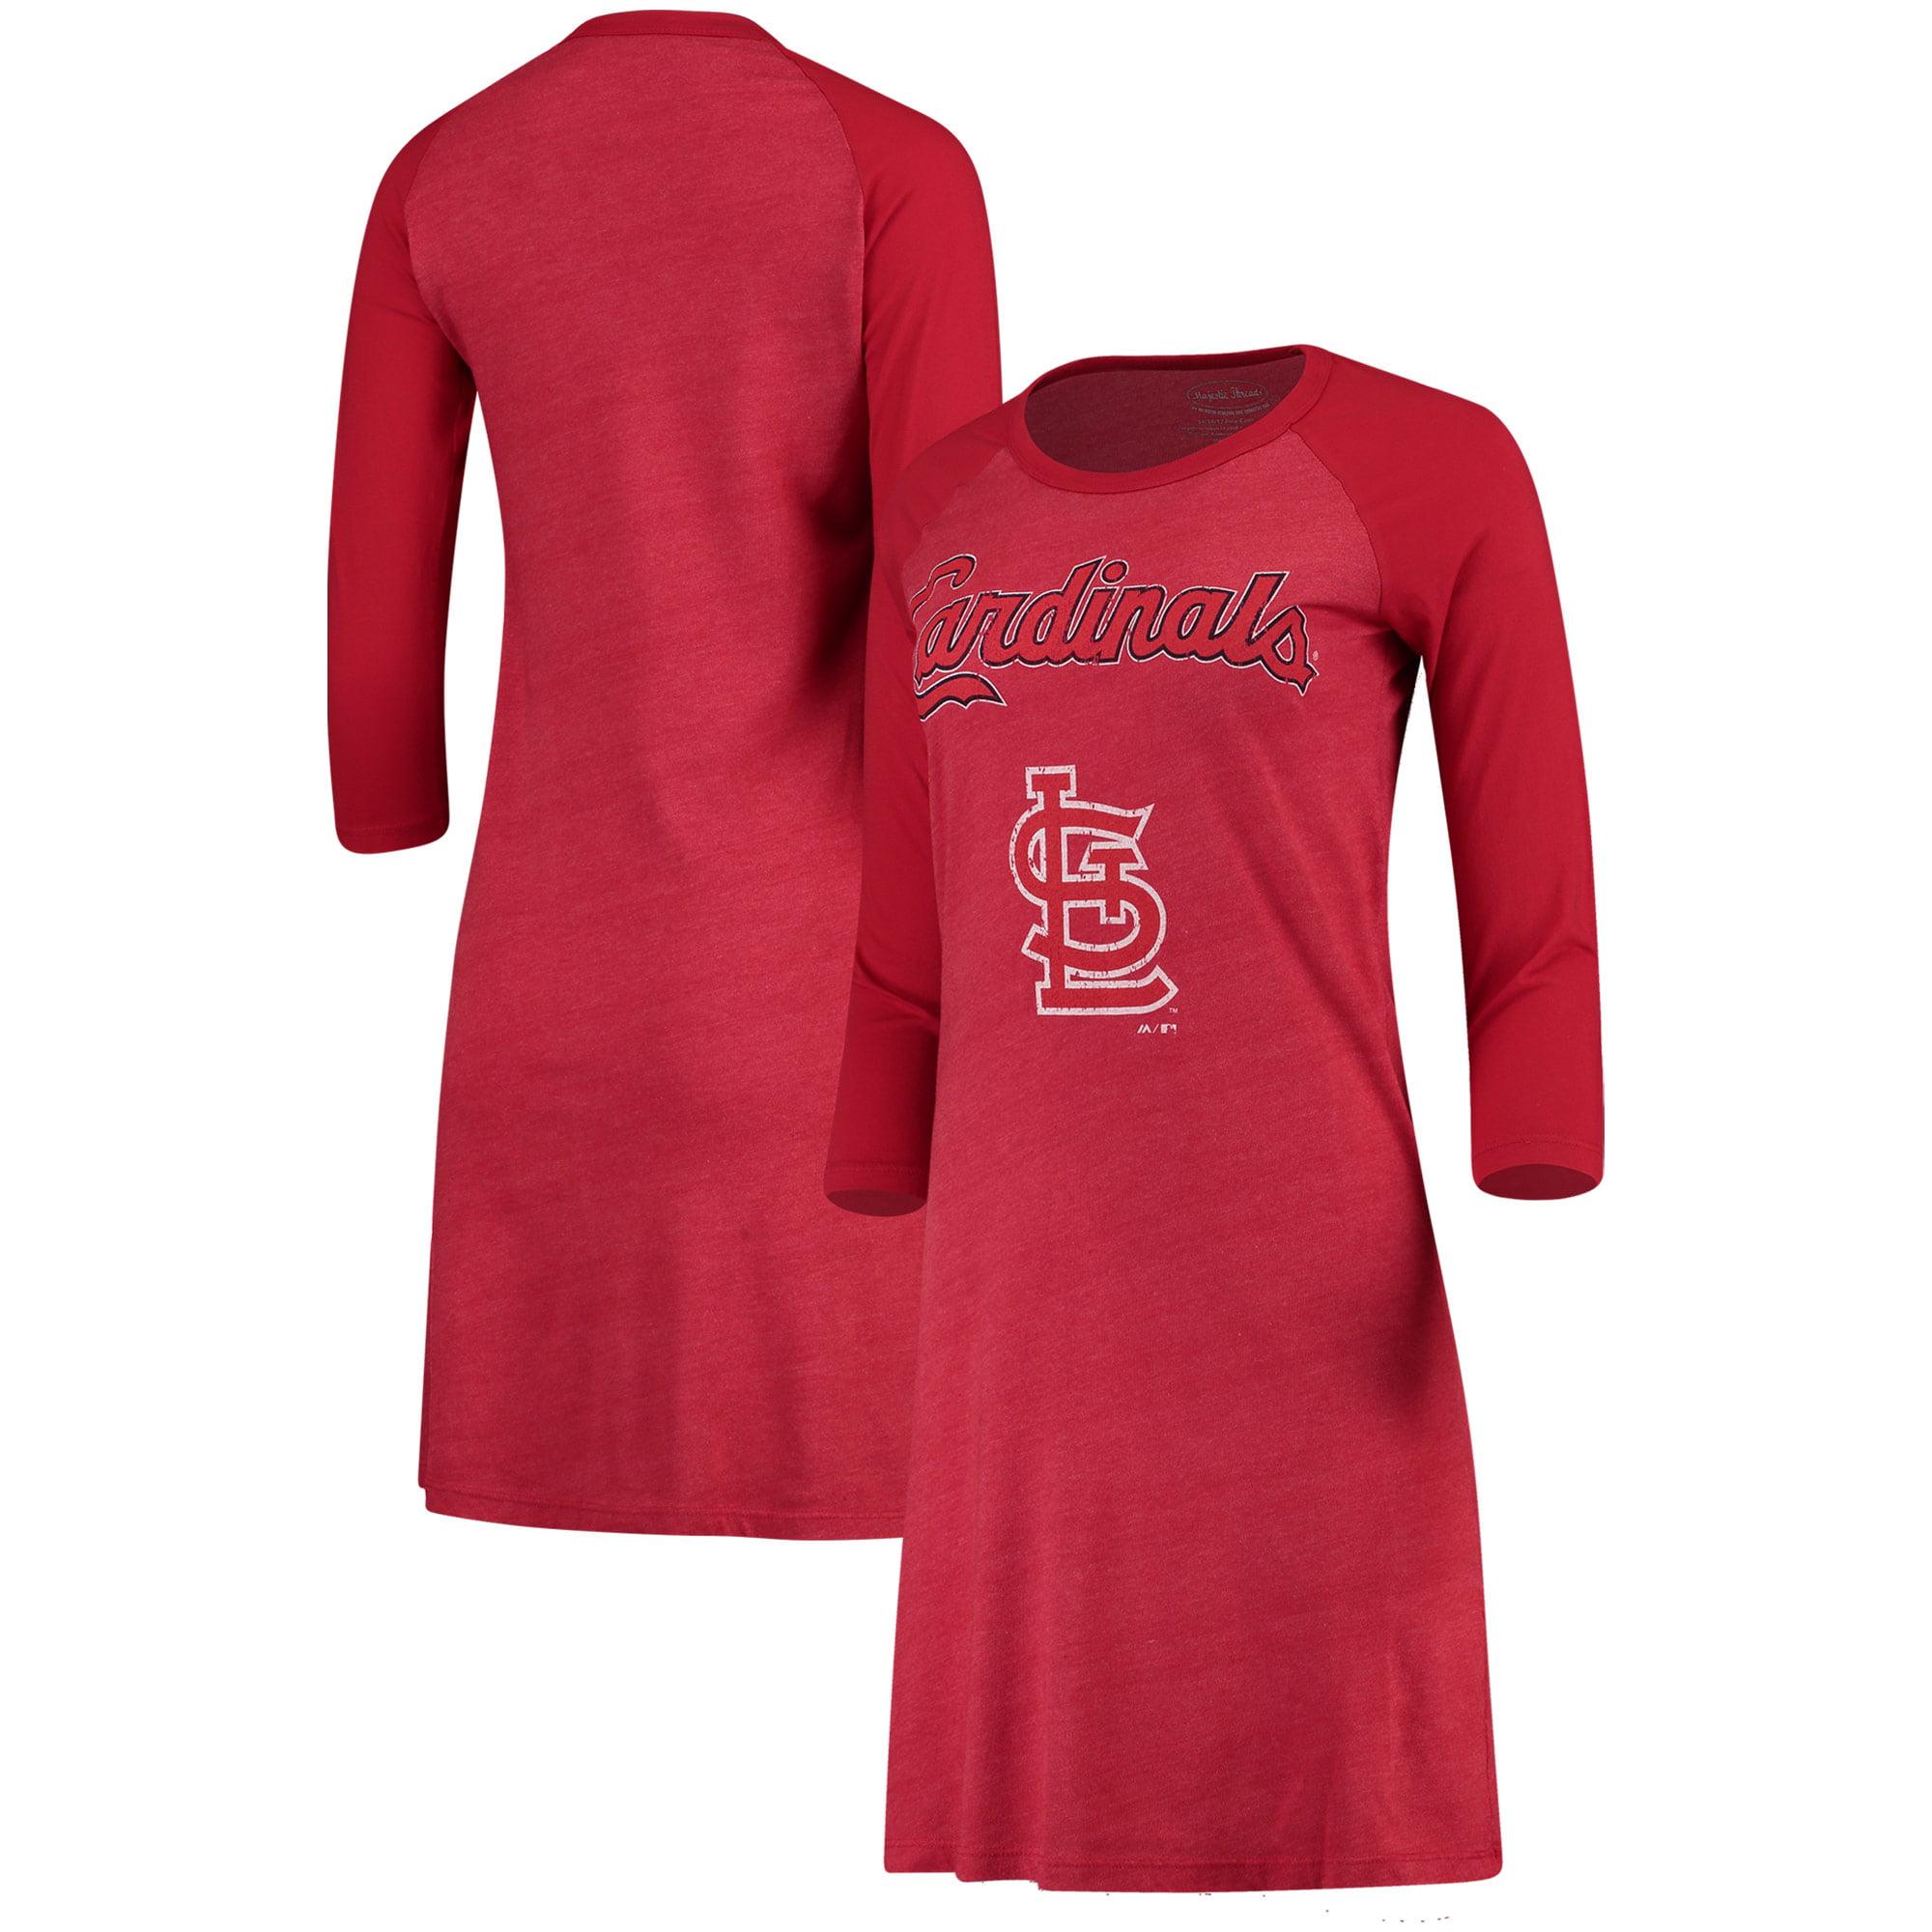 St. Louis Cardinals Majestic Threads Women's Tri-Blend 3/4-Sleeve Raglan Dress - Red